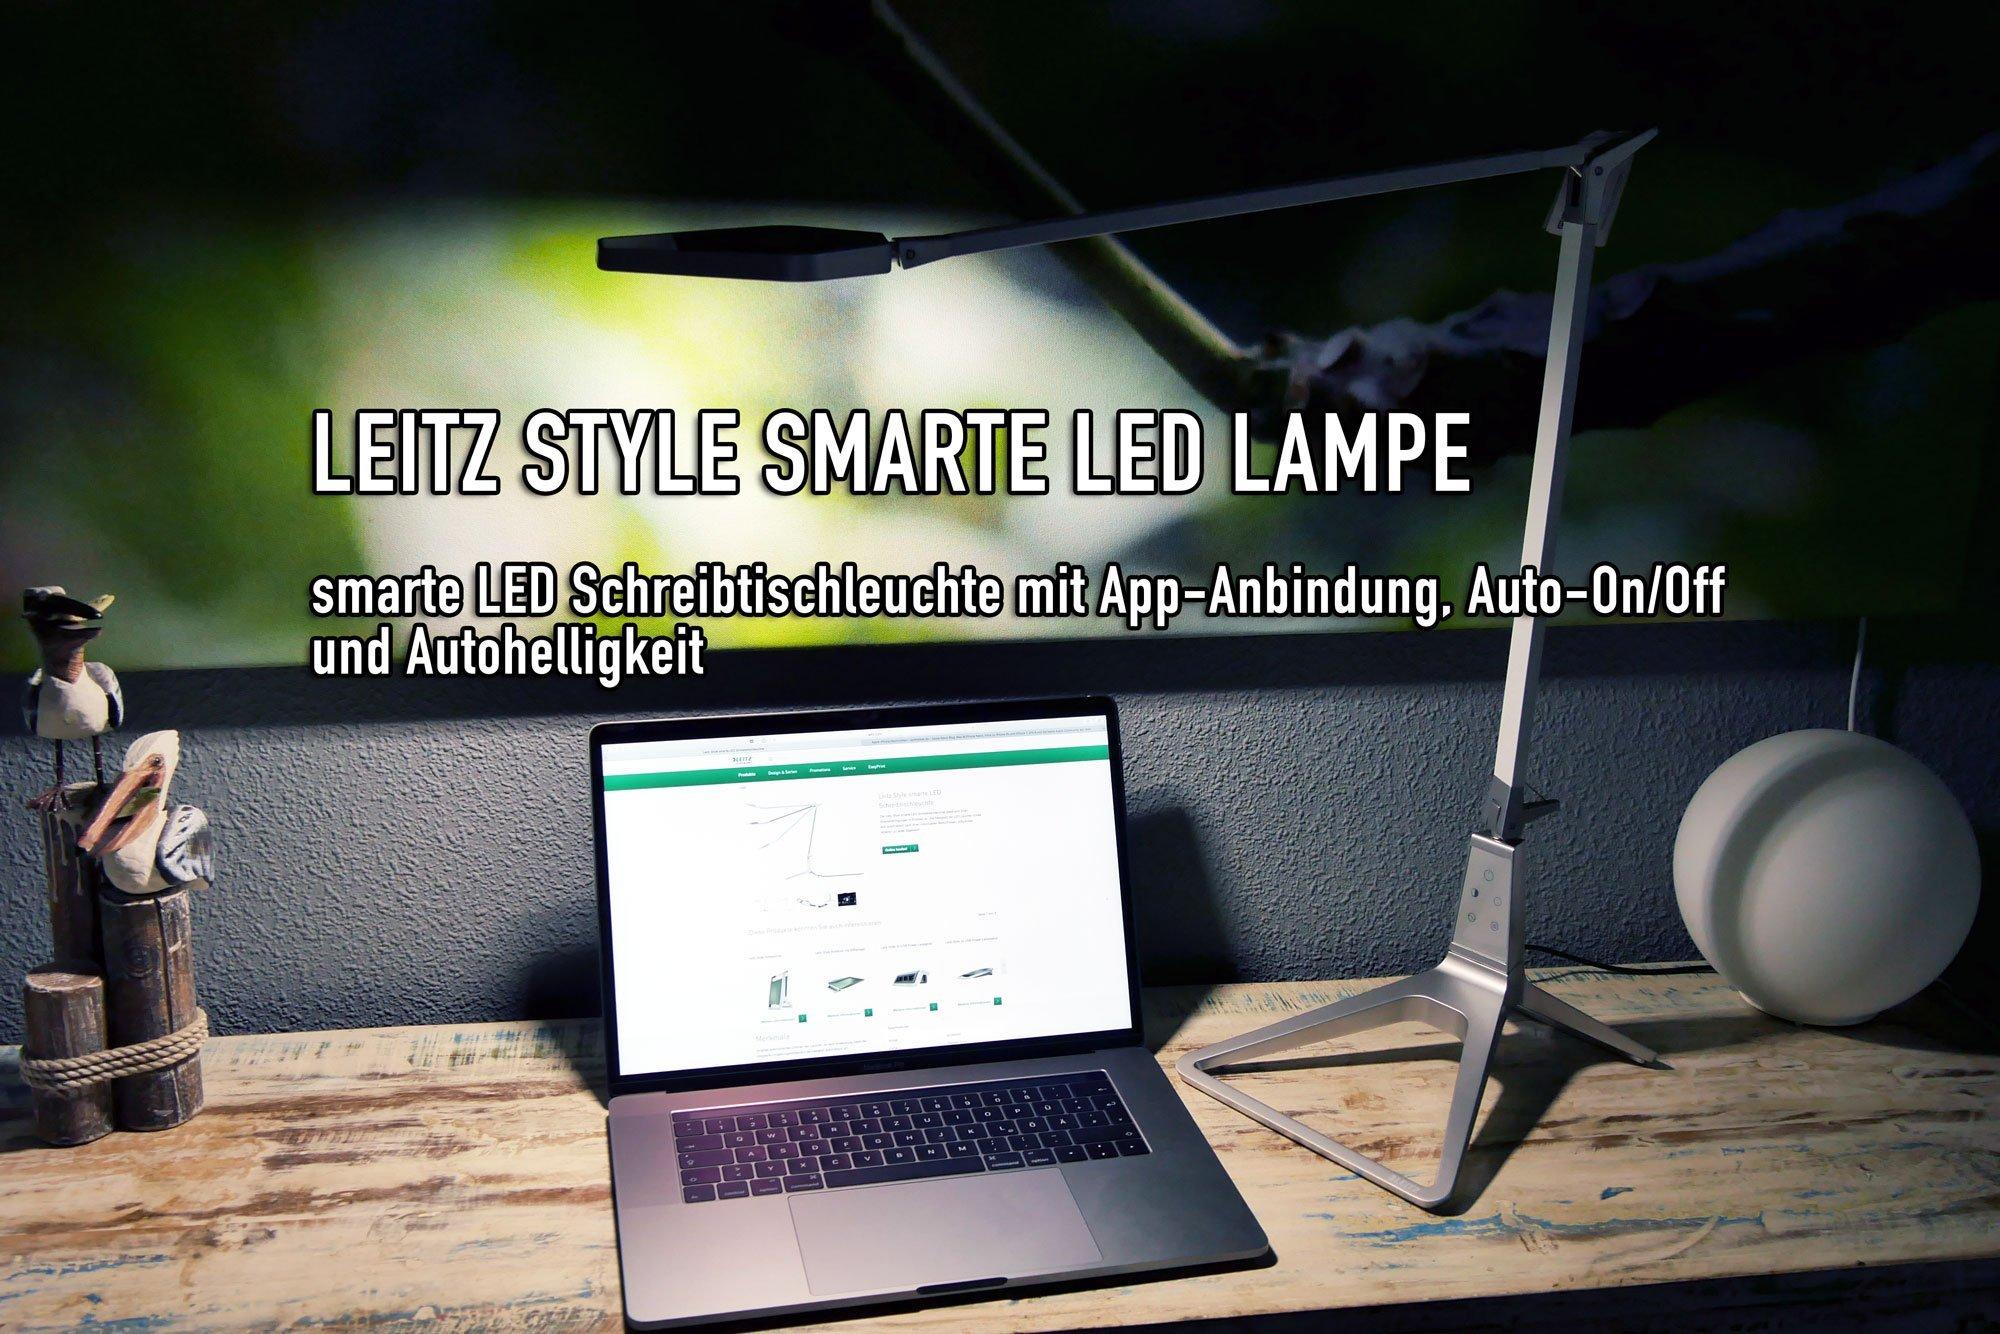 leitz-smart-led-lampe Spannende Lampen Per App Steuern Dekorationen